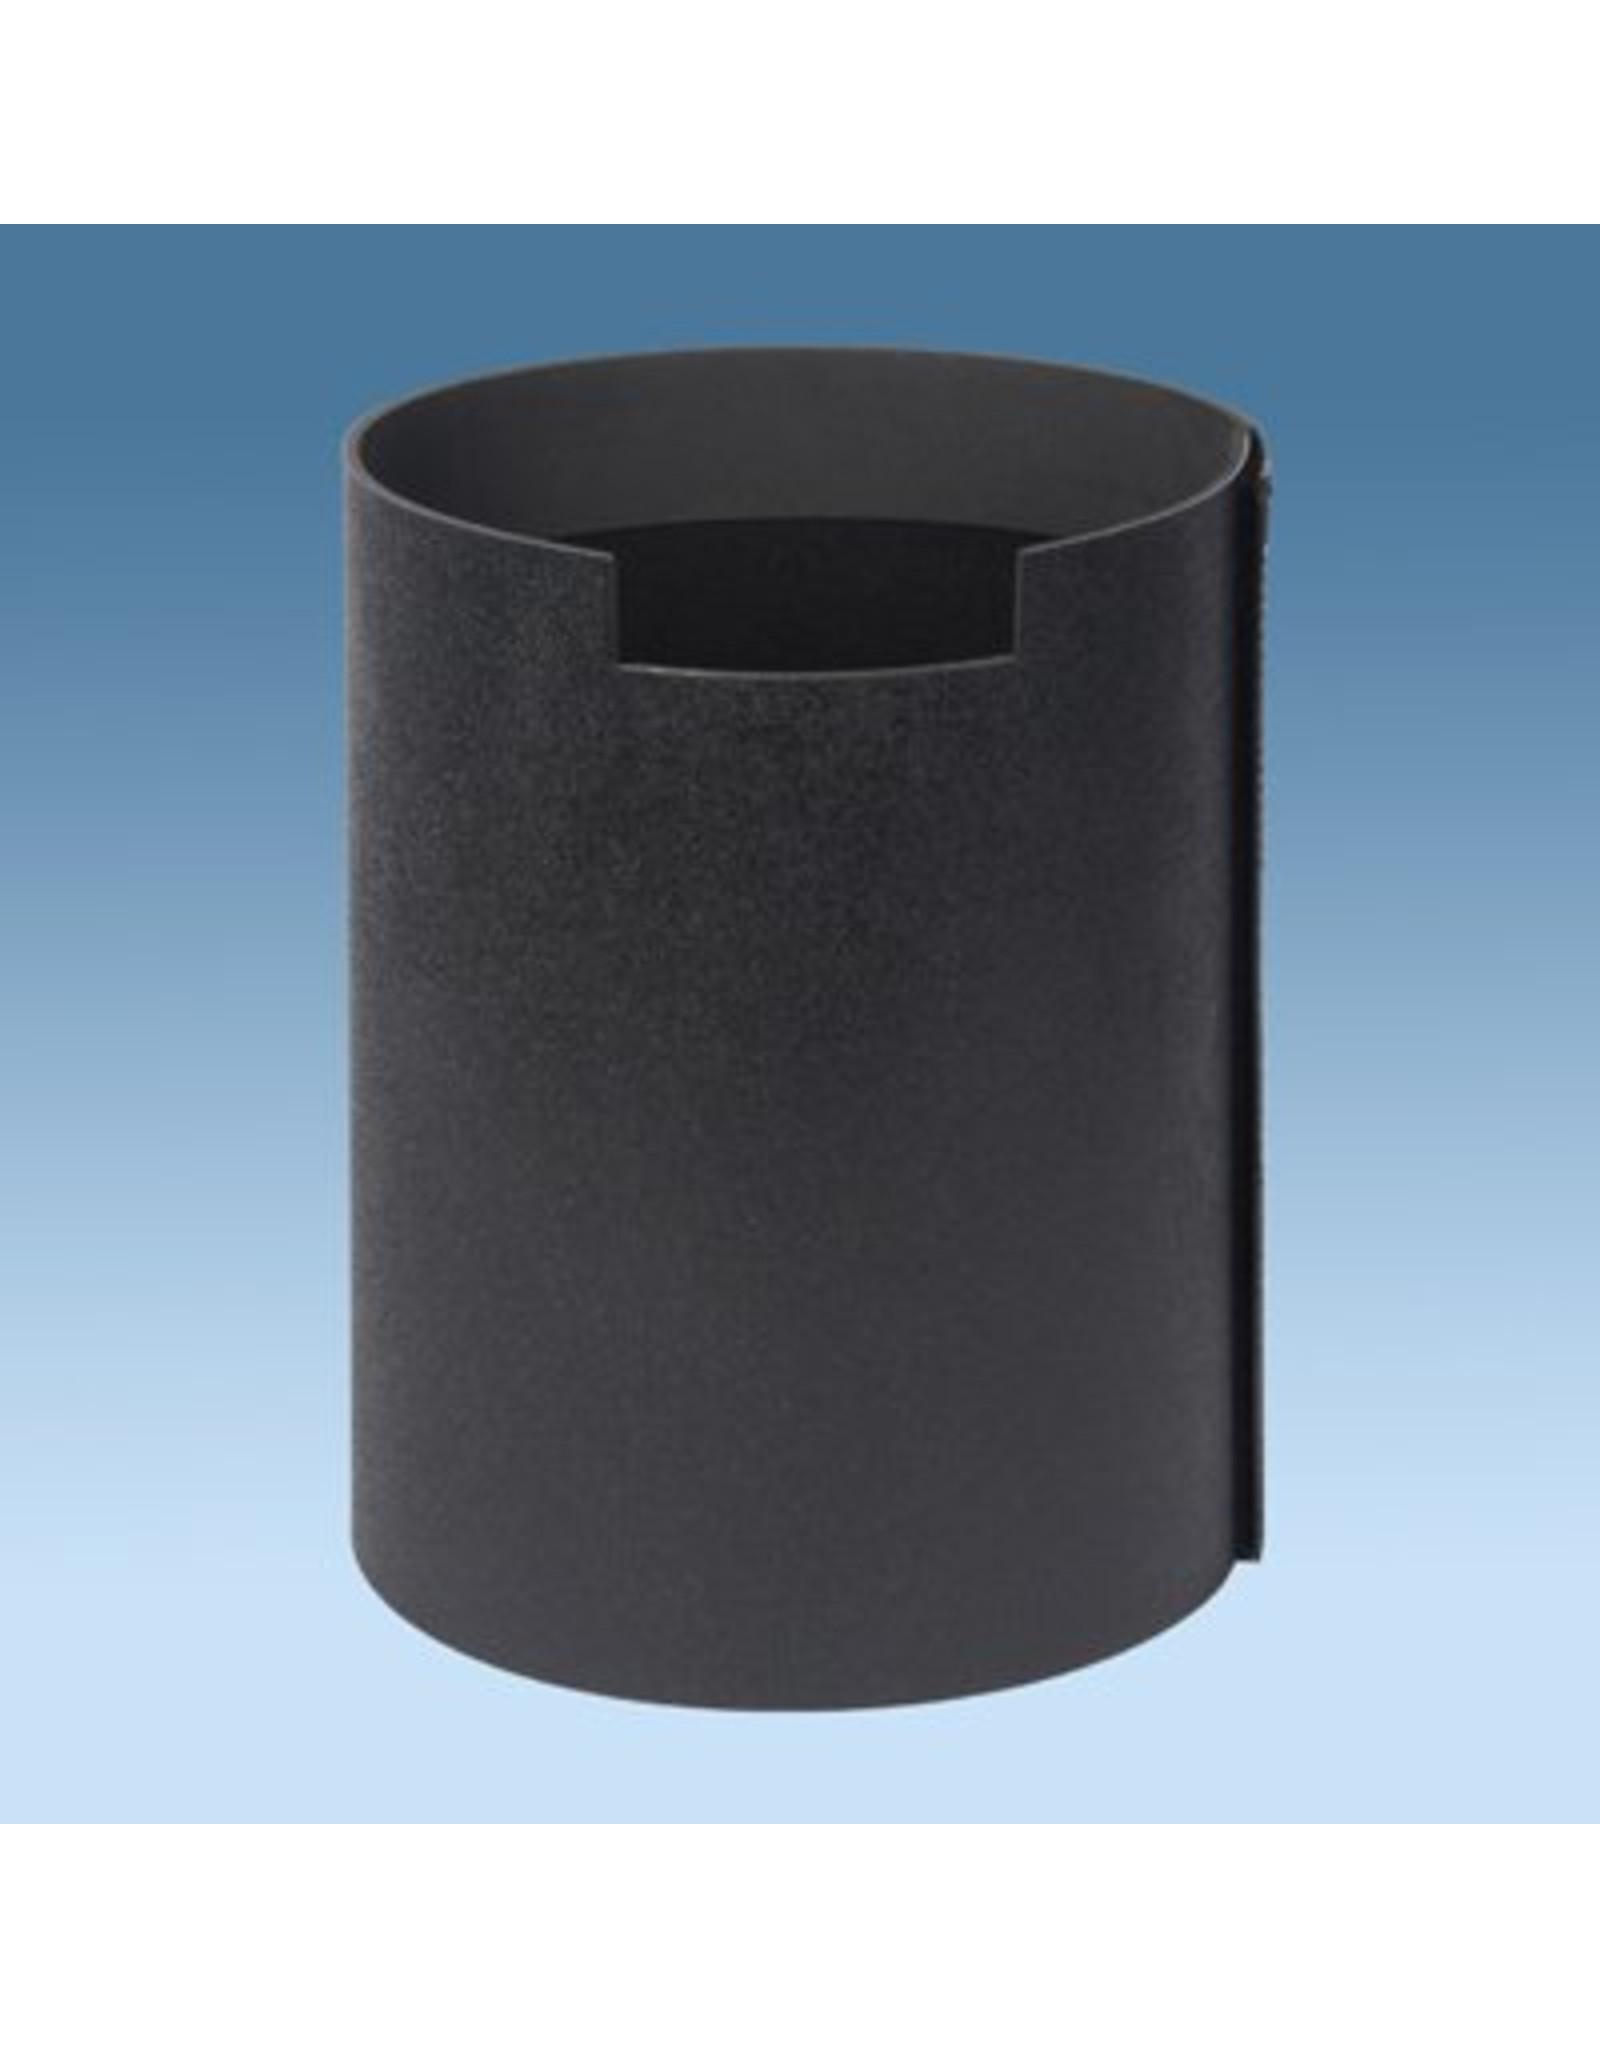 Astrozap Celestron 9.25 SCT Flexi-Shield™ Flexible Dew Shield - with Lower Dovetail Notch